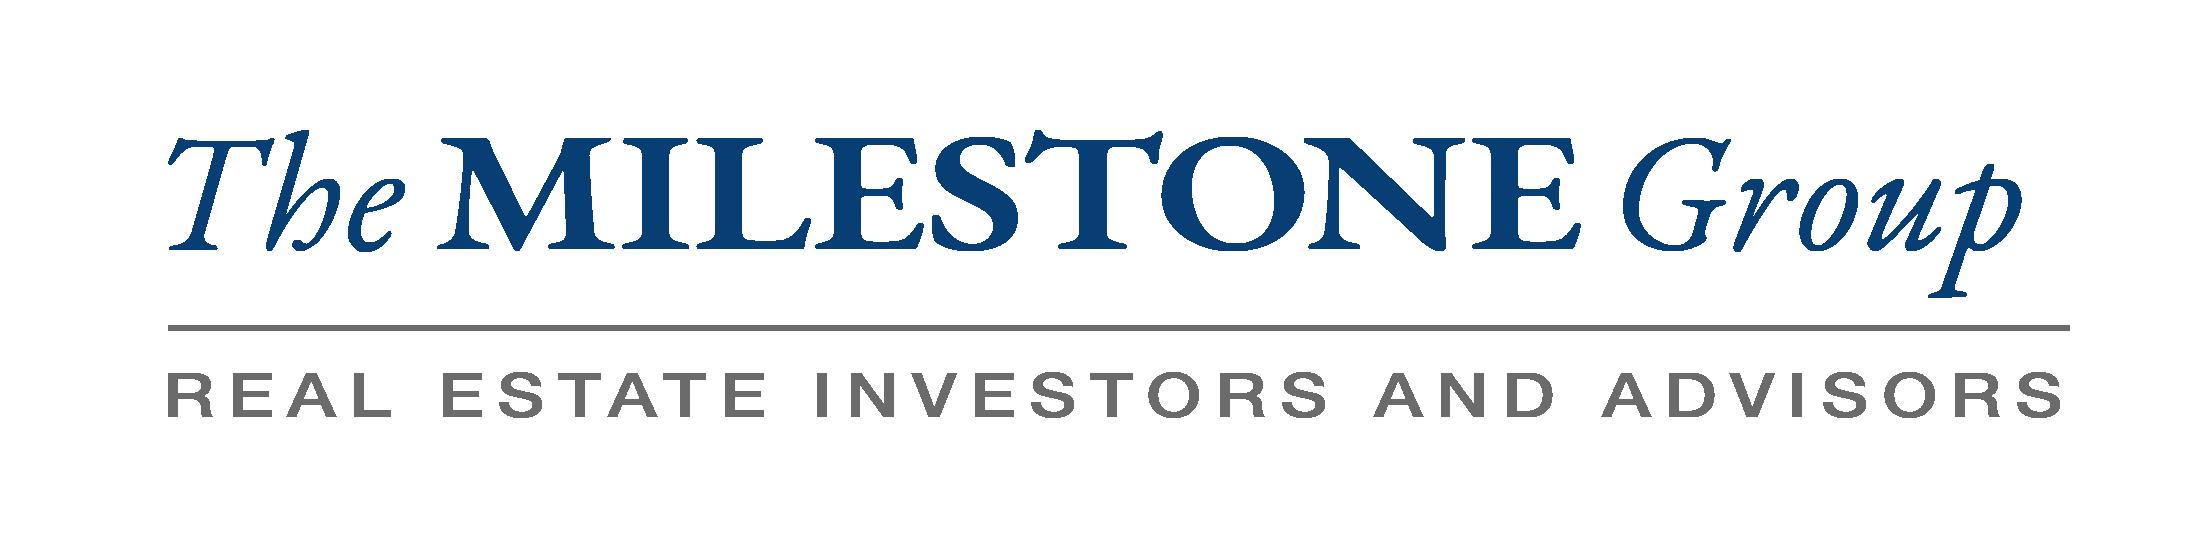 The Milestone Group logo